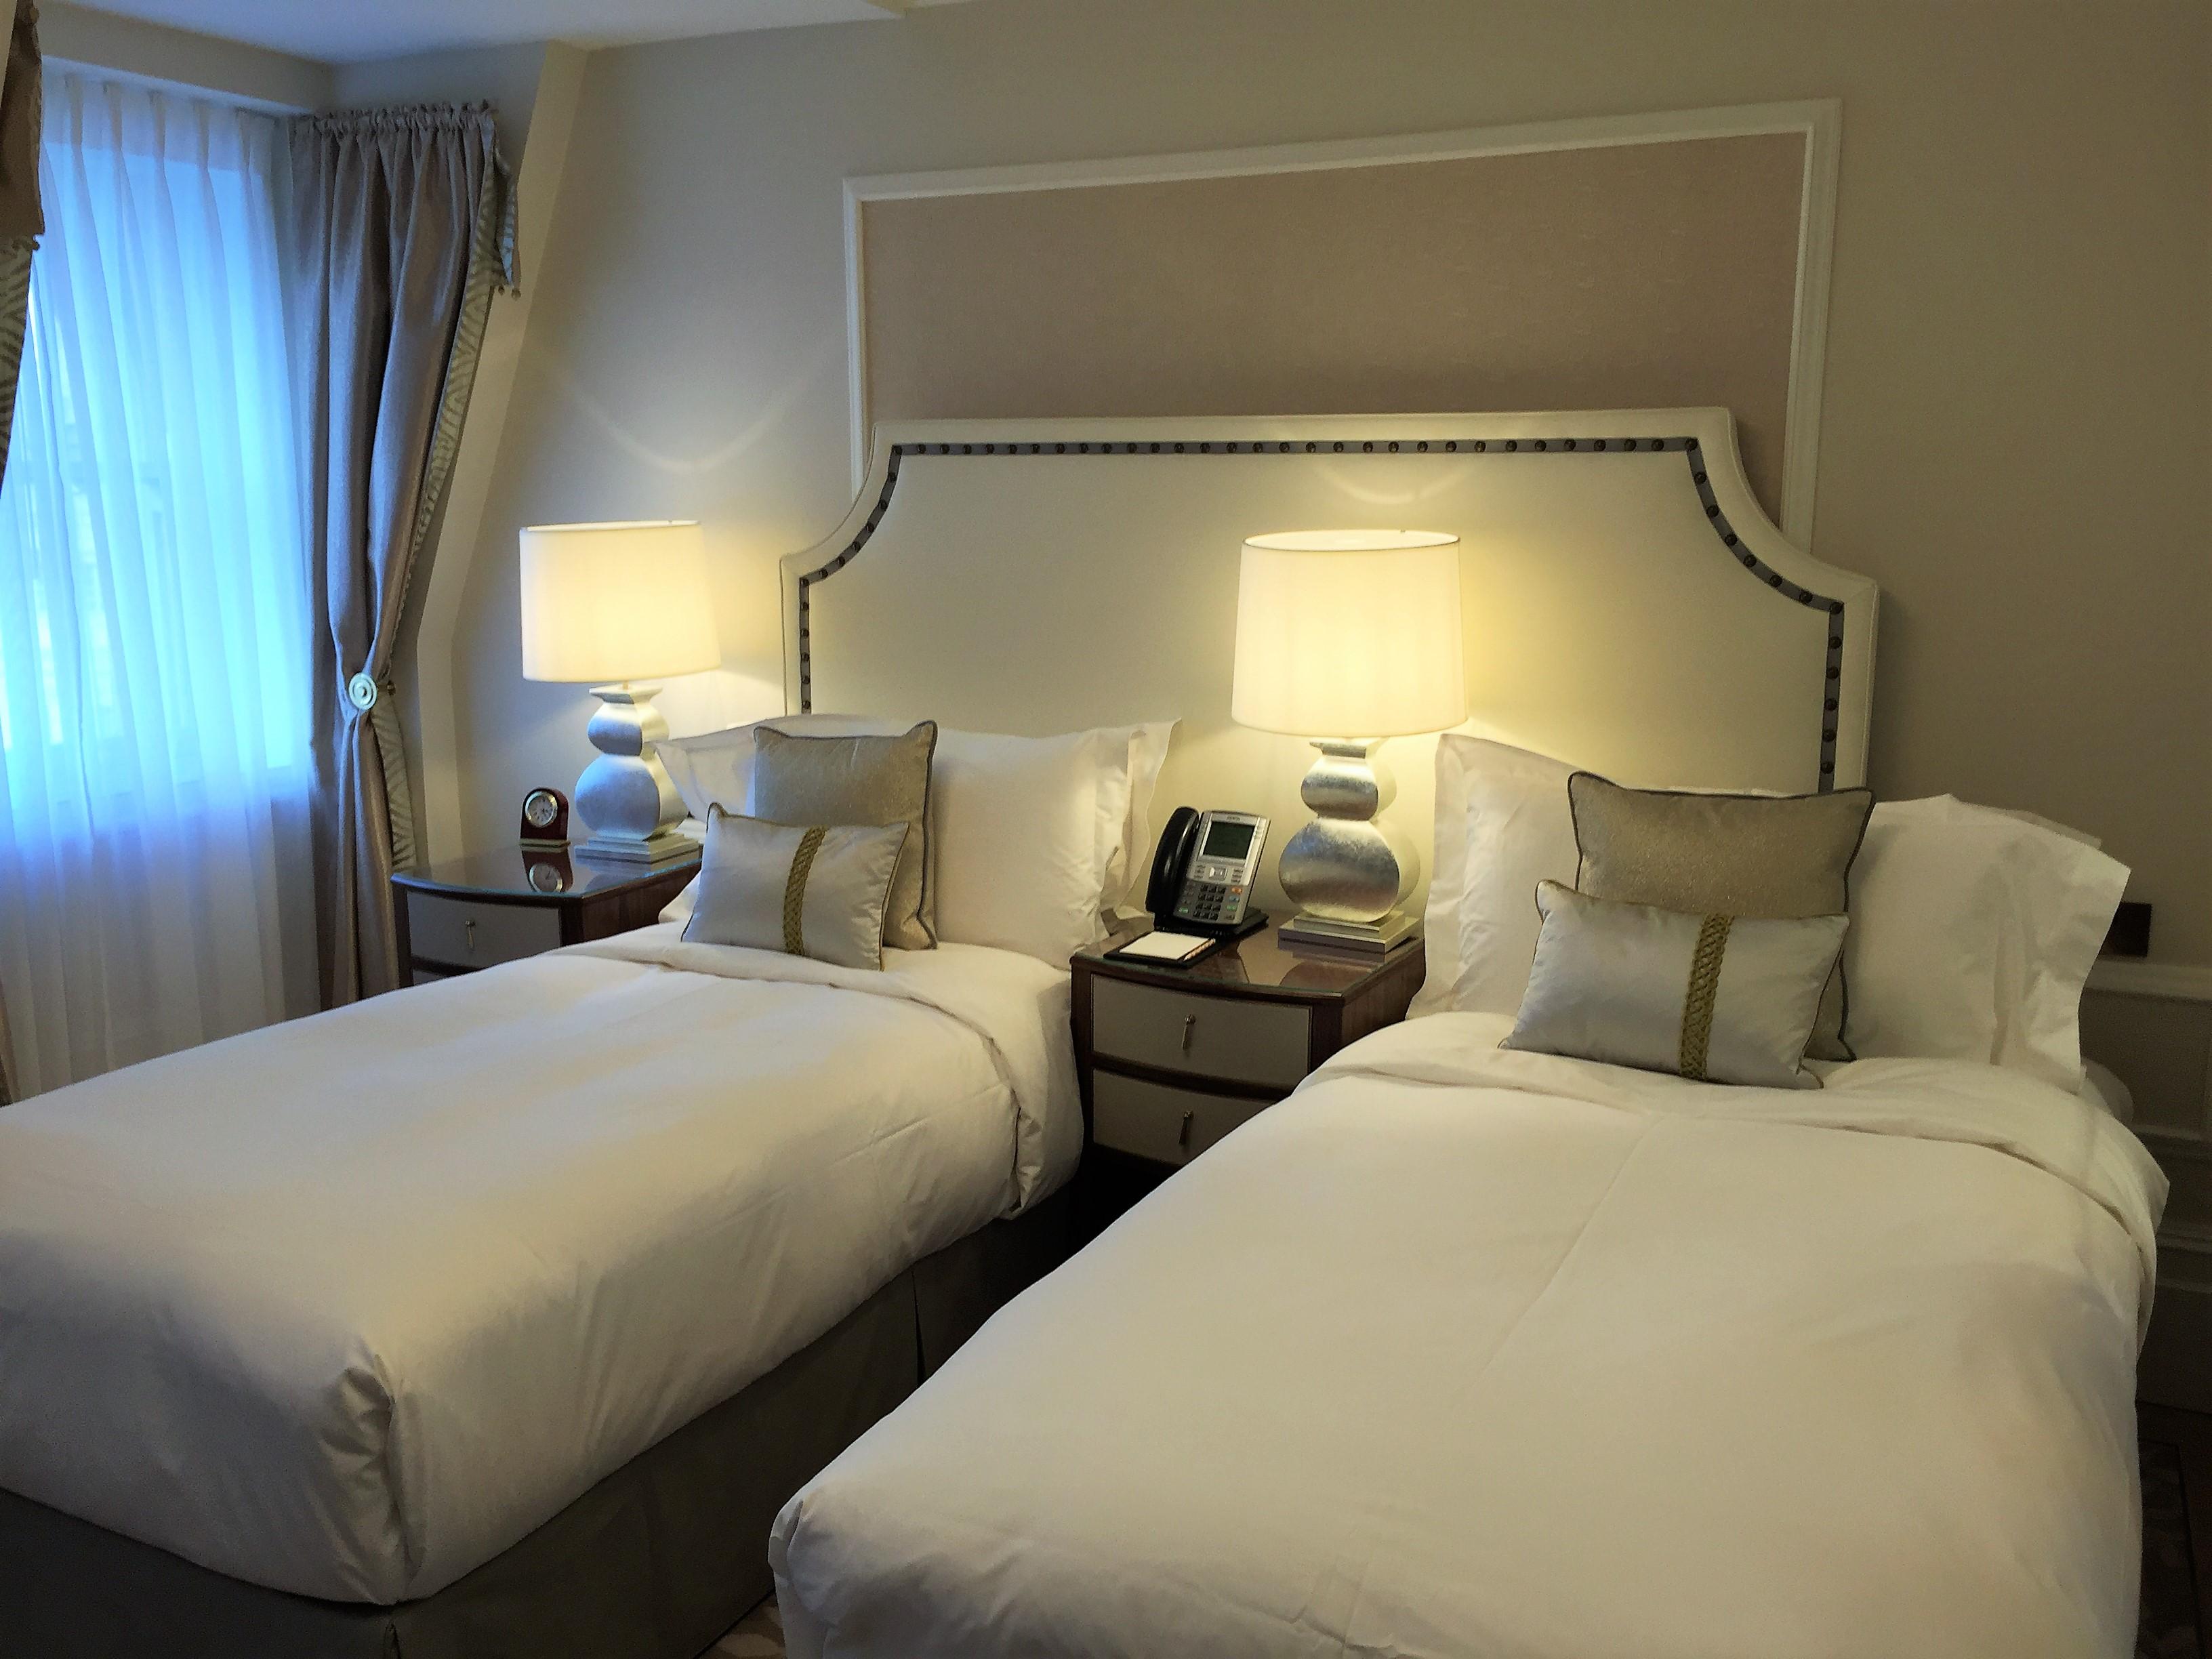 Langham hotel London review